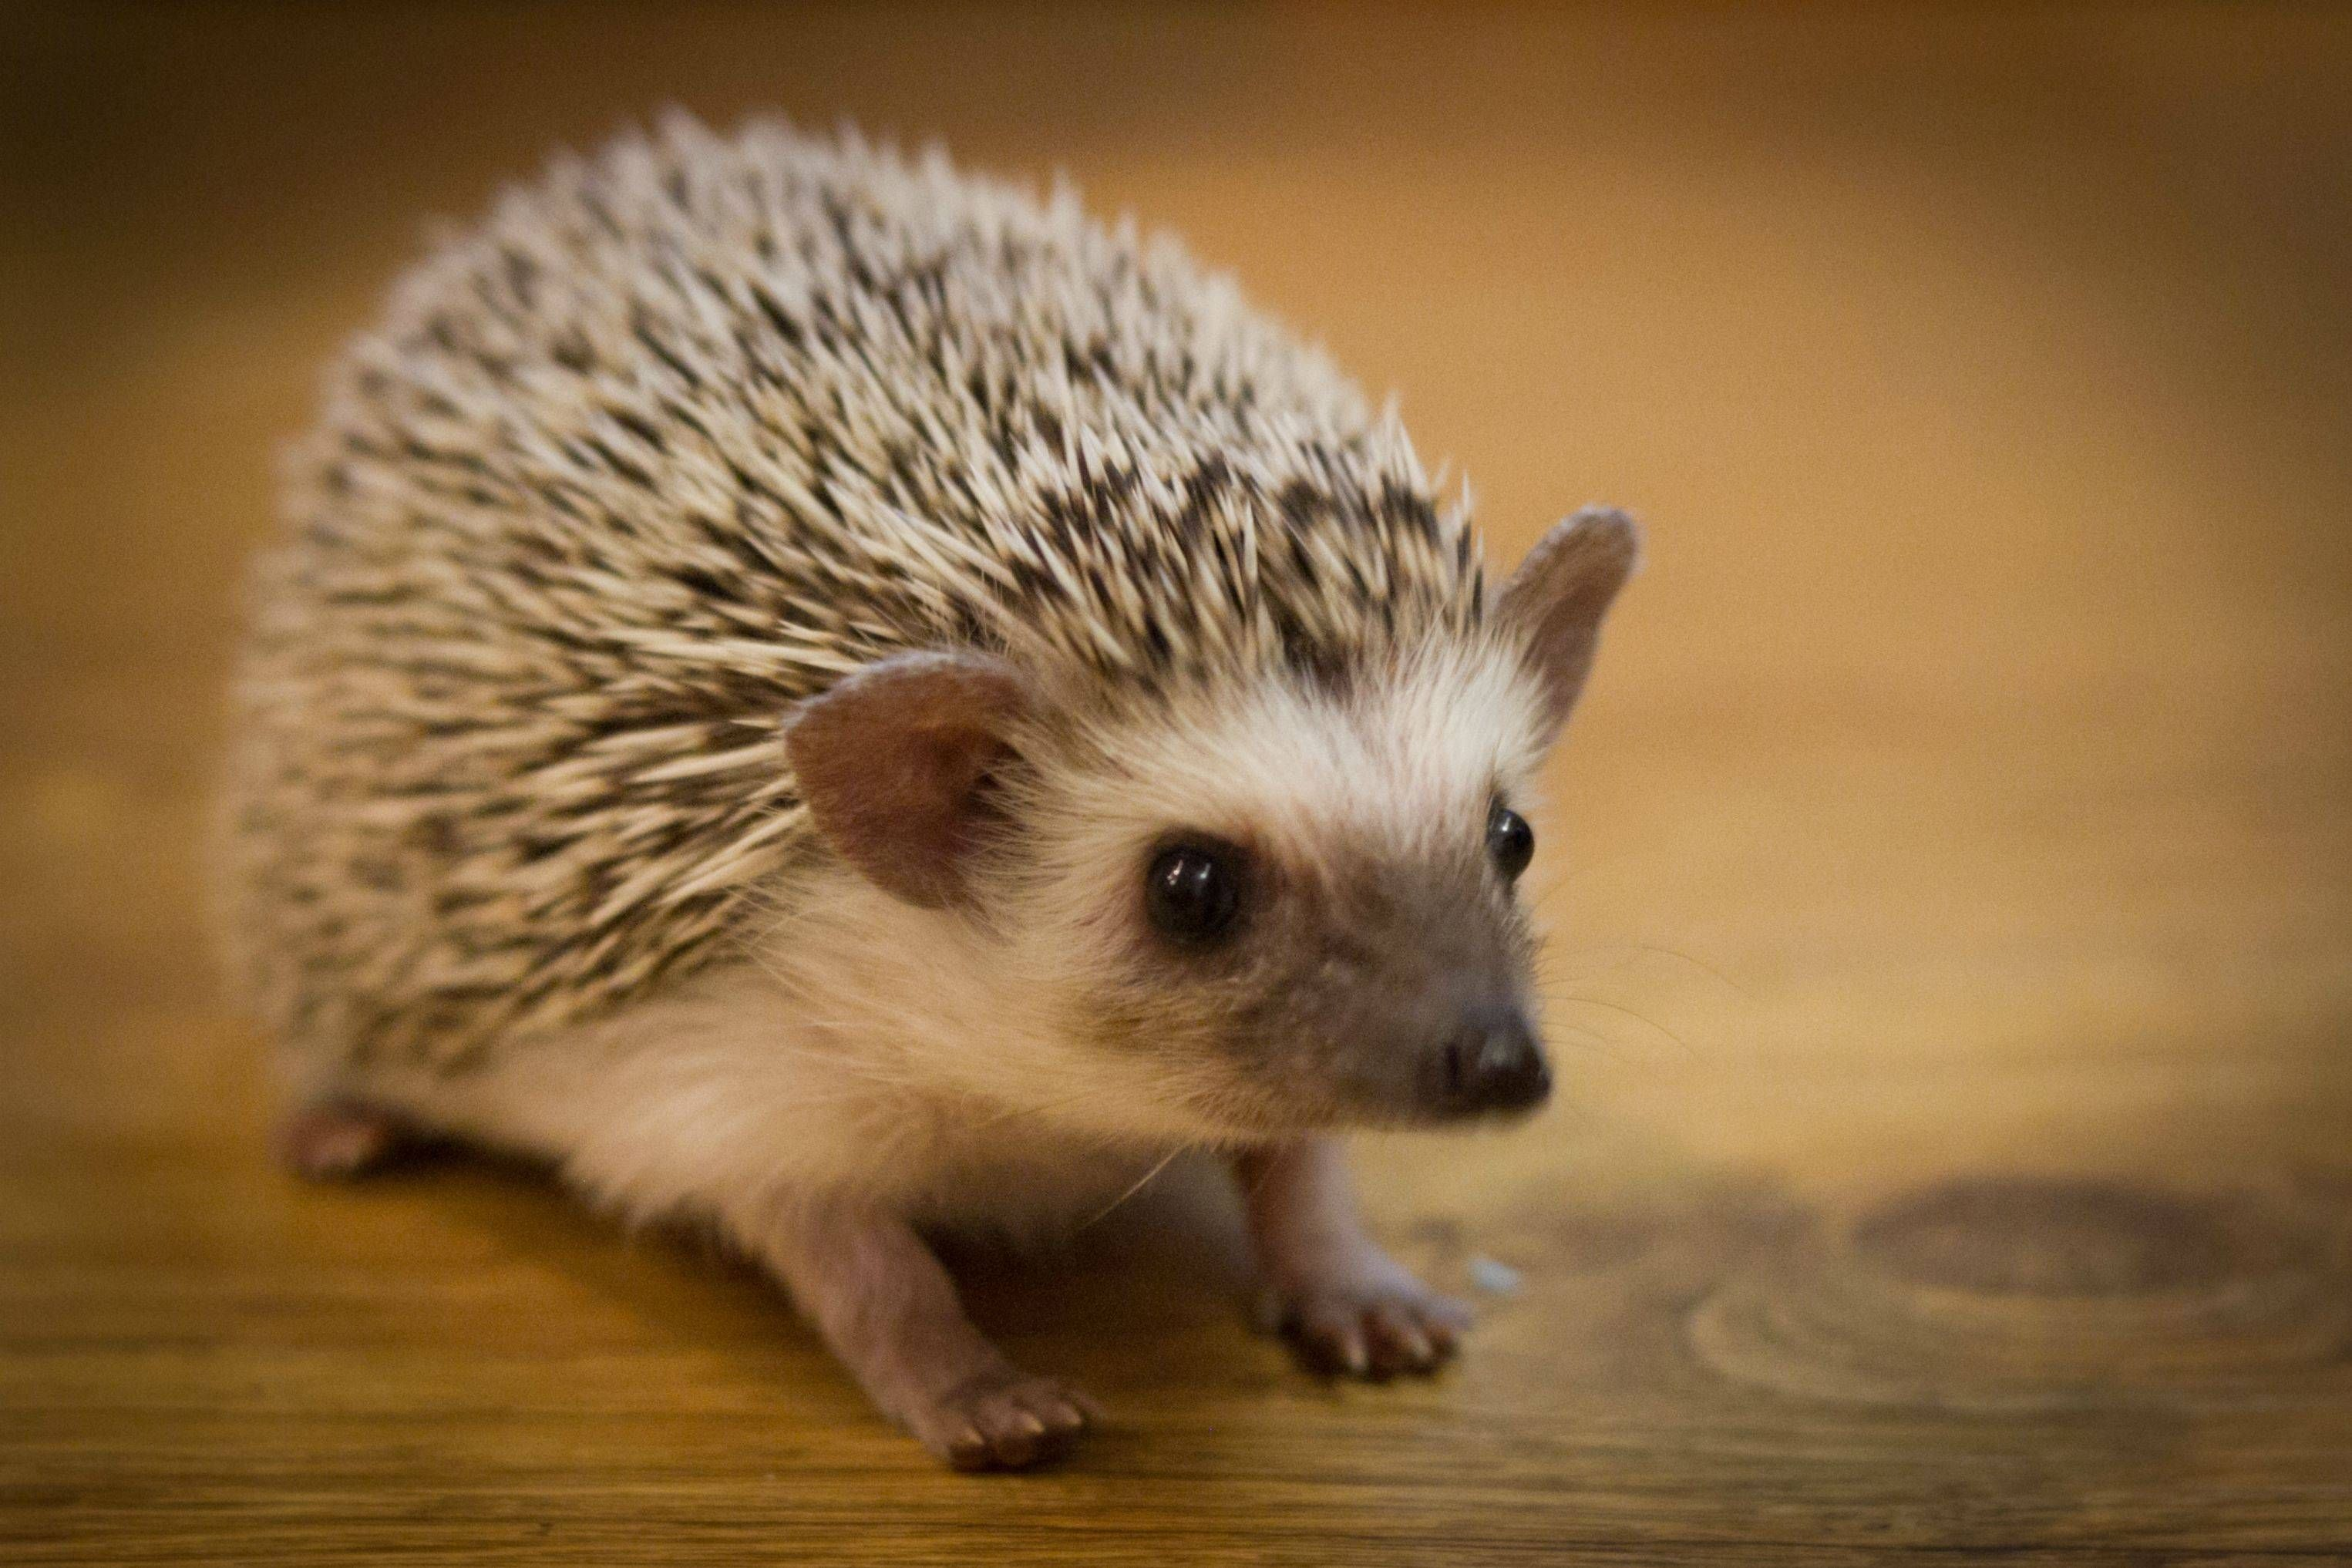 Hedgehog Pet Price >> A Pet Hedgehog Called Sushi All Things Fluffy Hedgehog